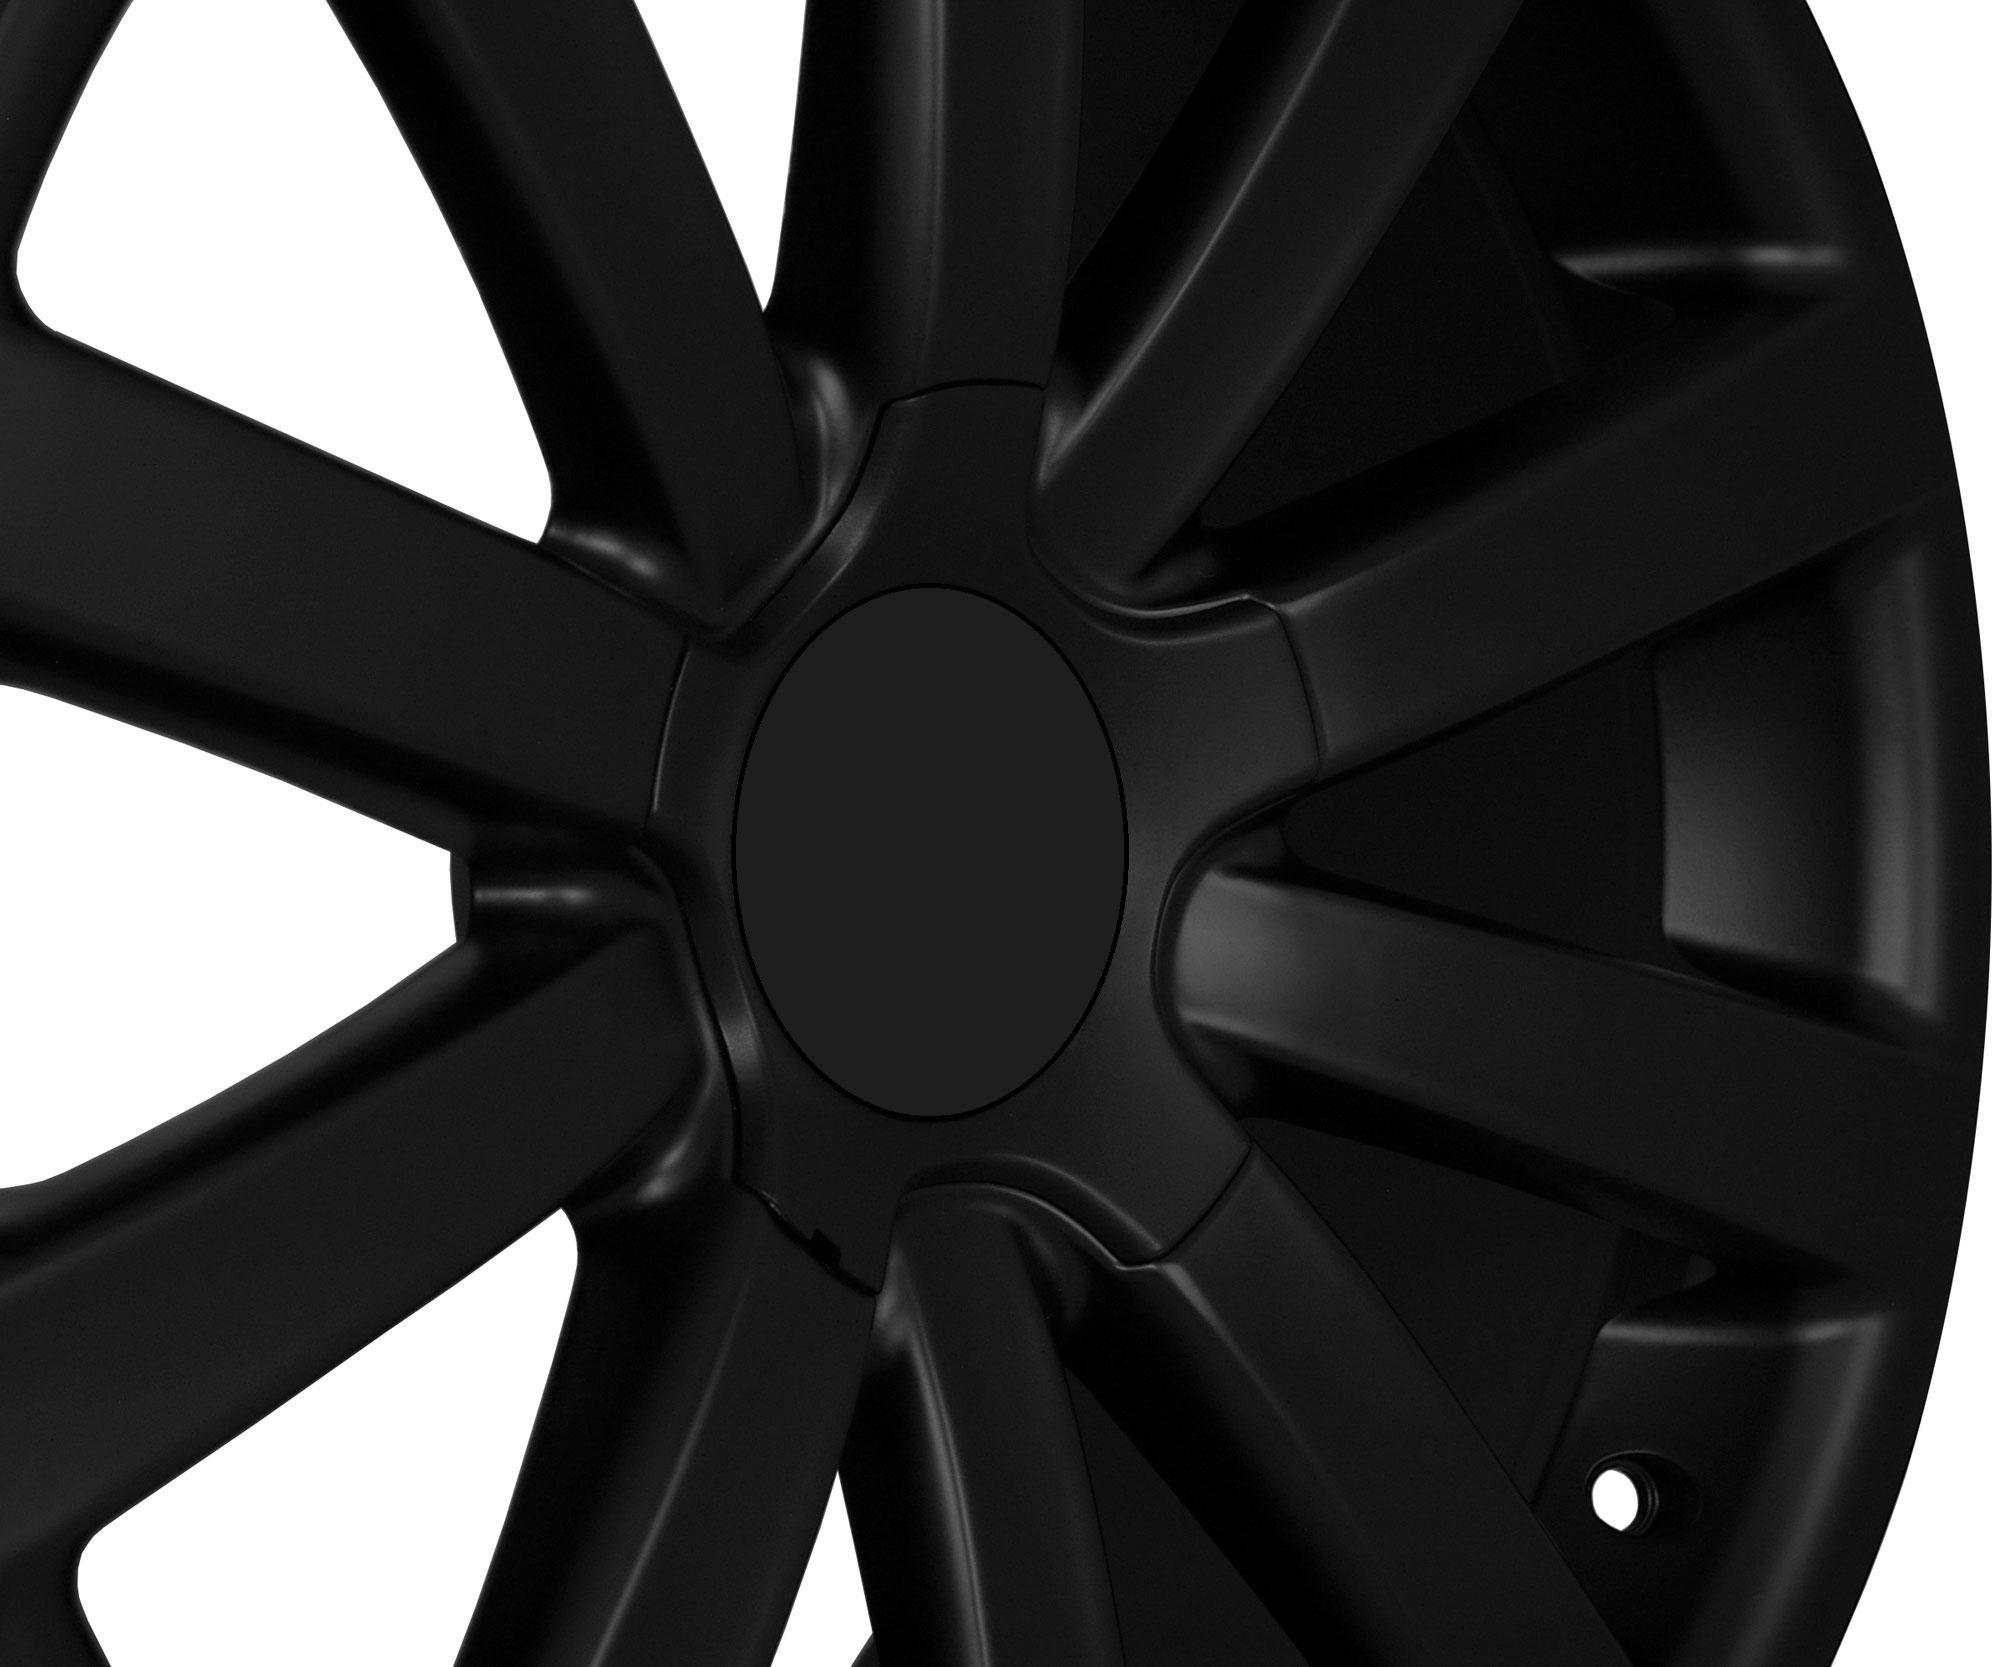 18 VW R32 Matte Black Wheels Rims Fit VW Jetta MKV Mkvi Passat B6 CC